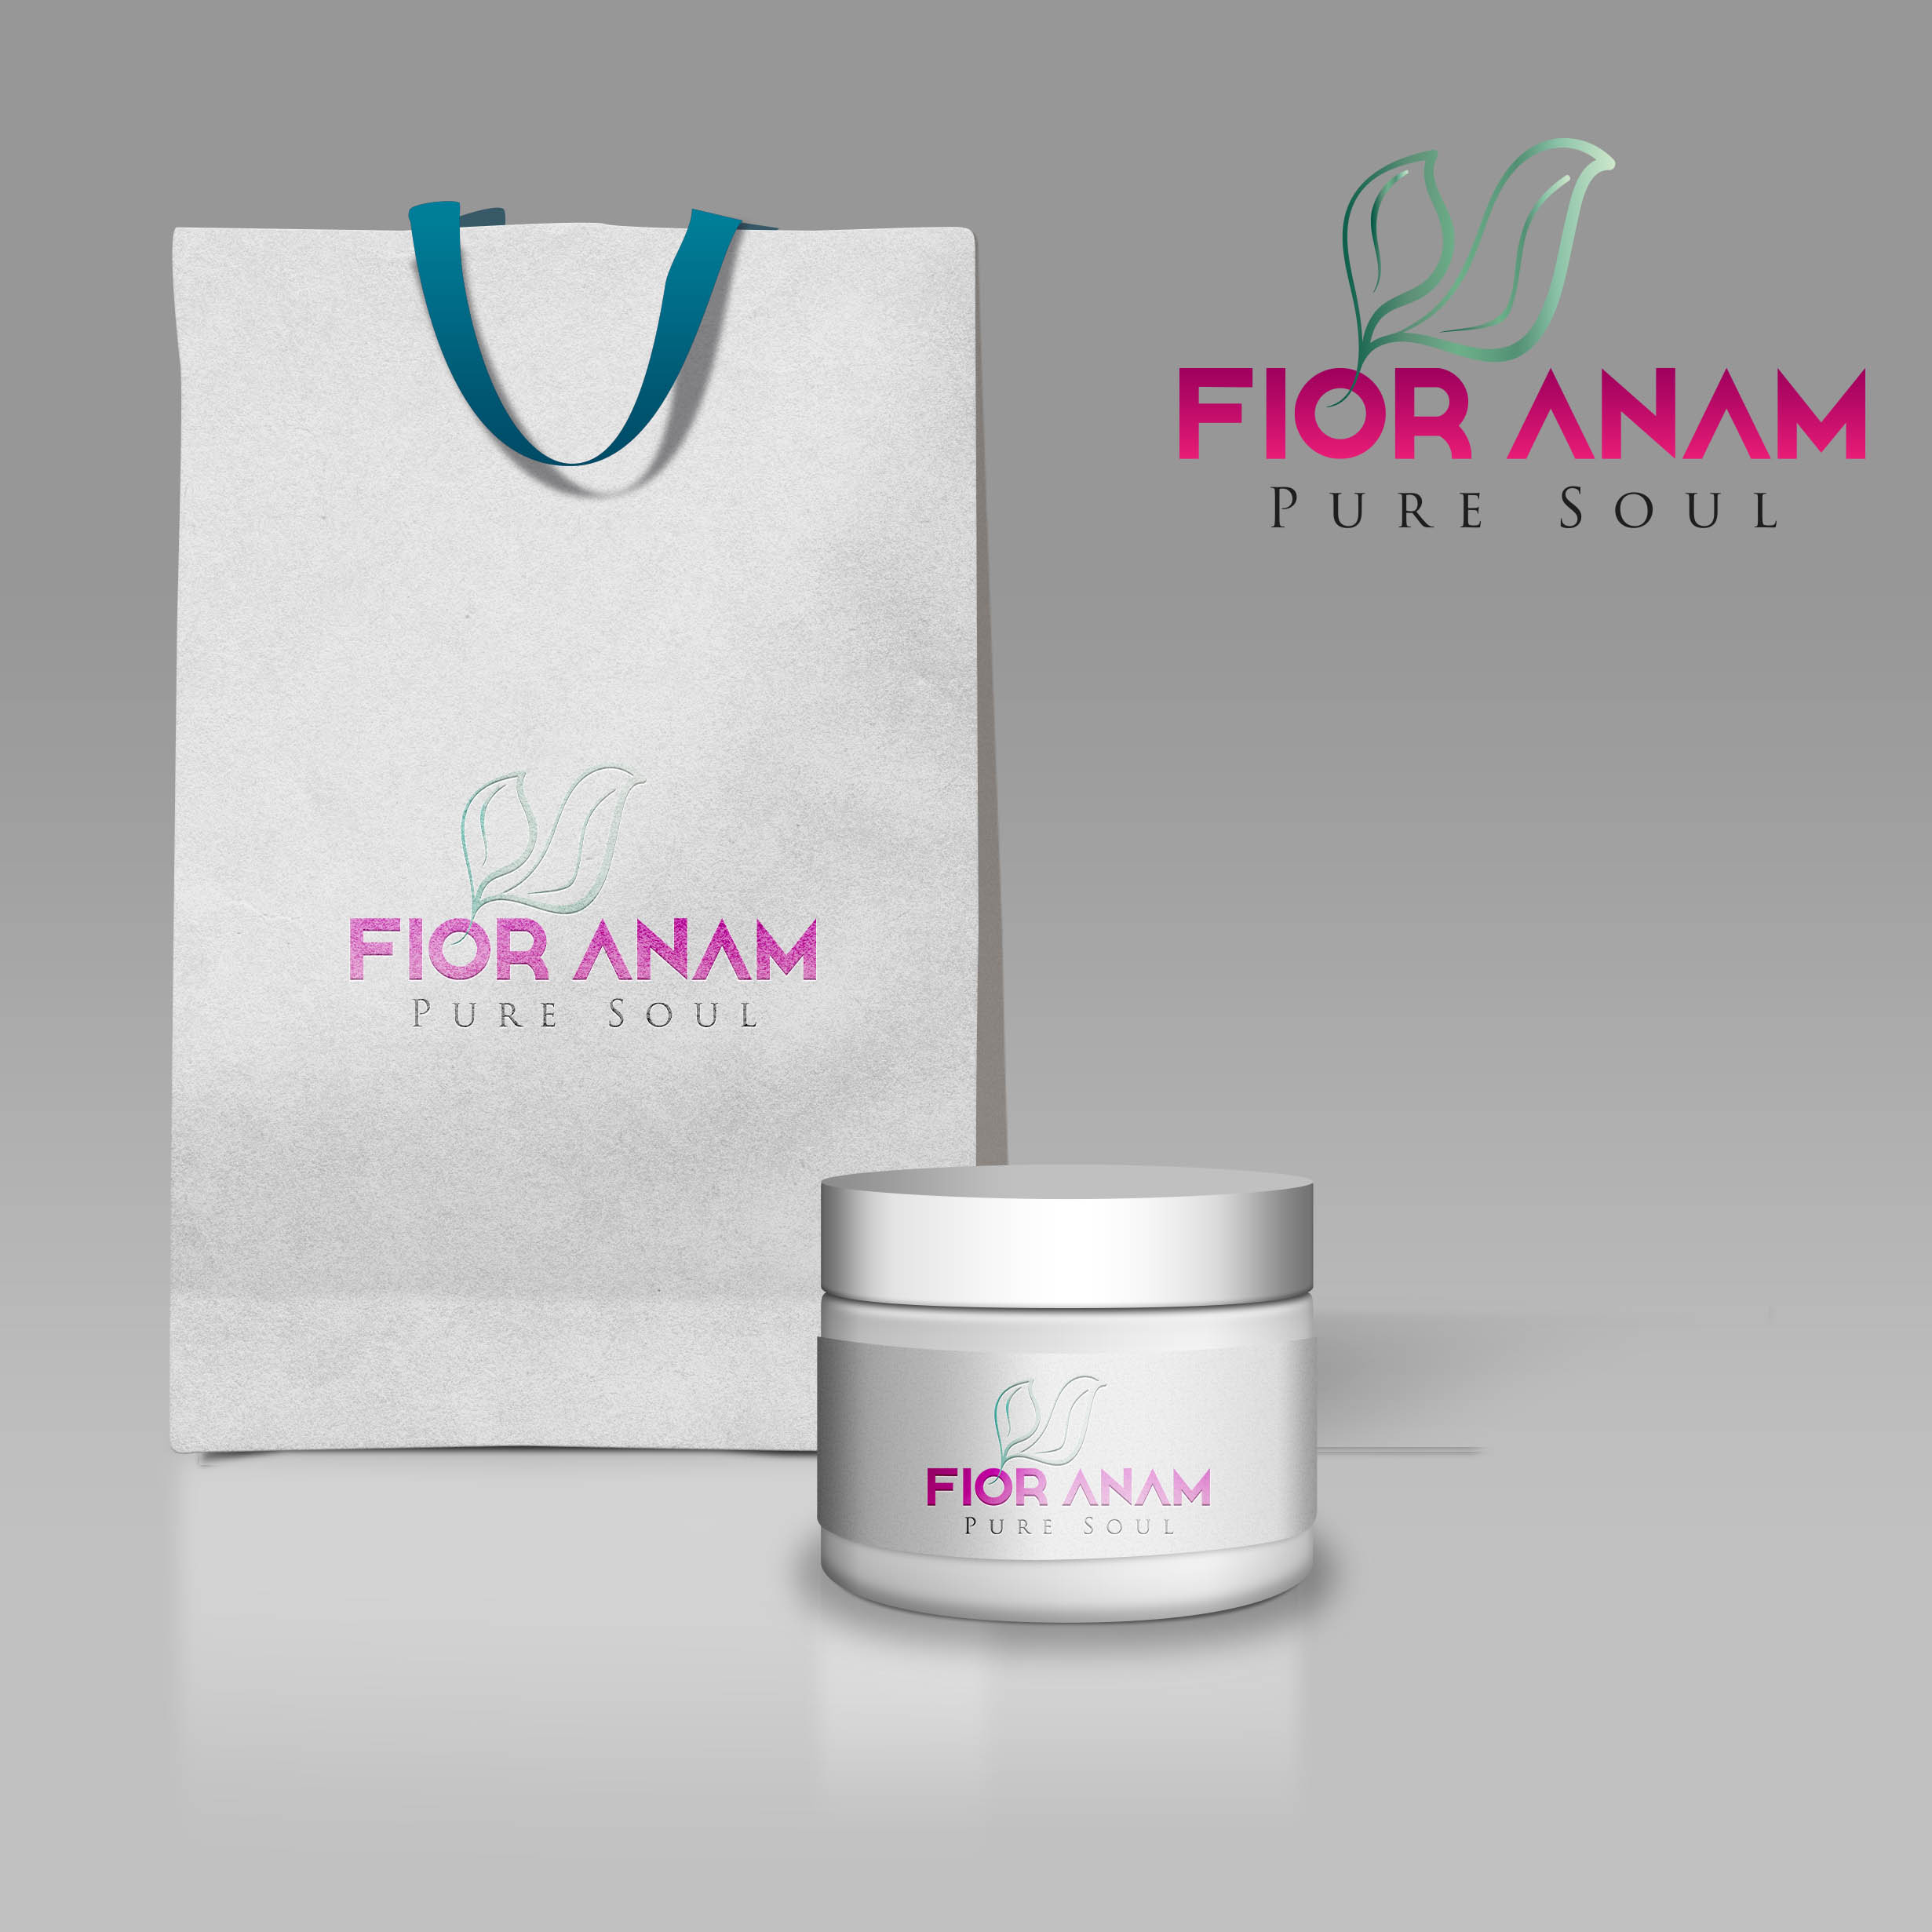 Logo Design by M h Rubel - Entry No. 369 in the Logo Design Contest Creative Logo Design for Fior Anam.